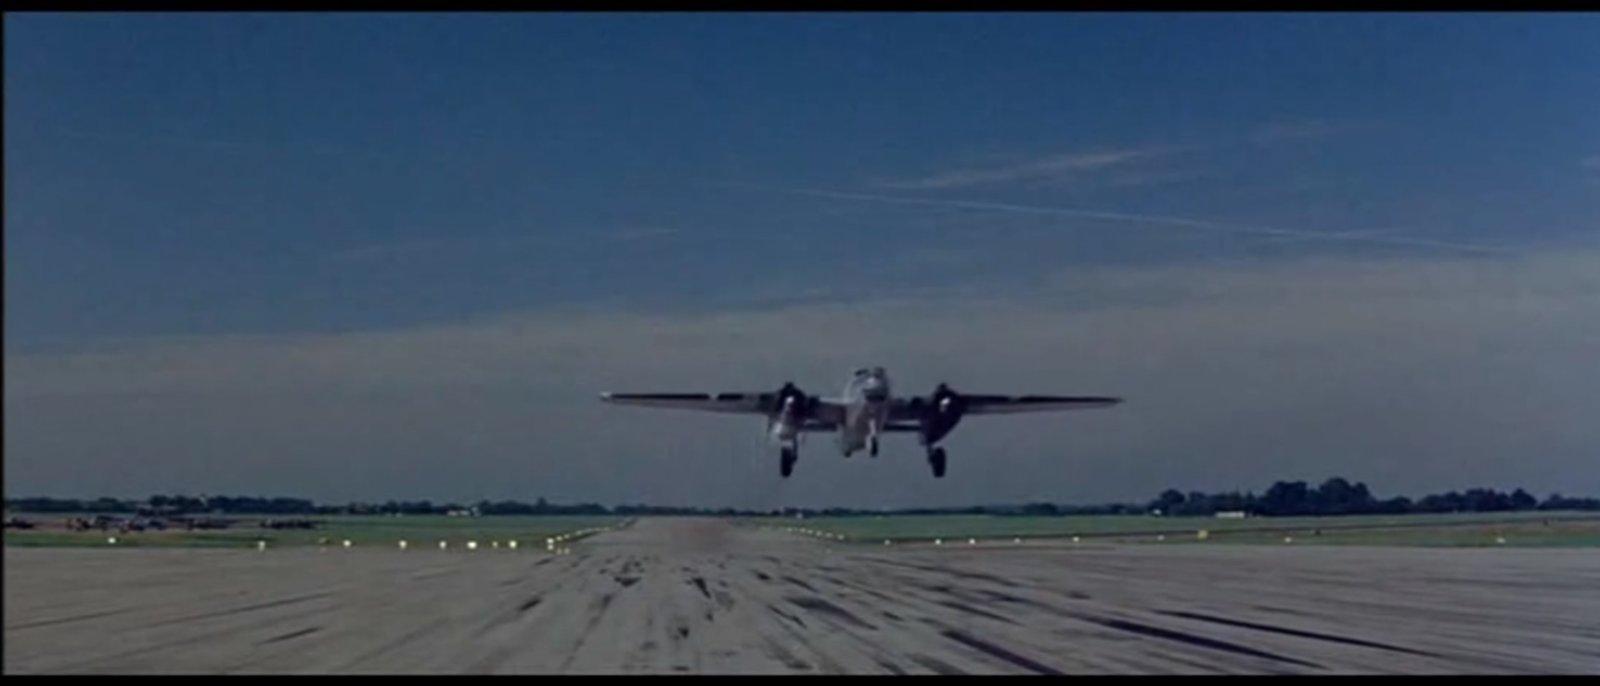 633squadron.